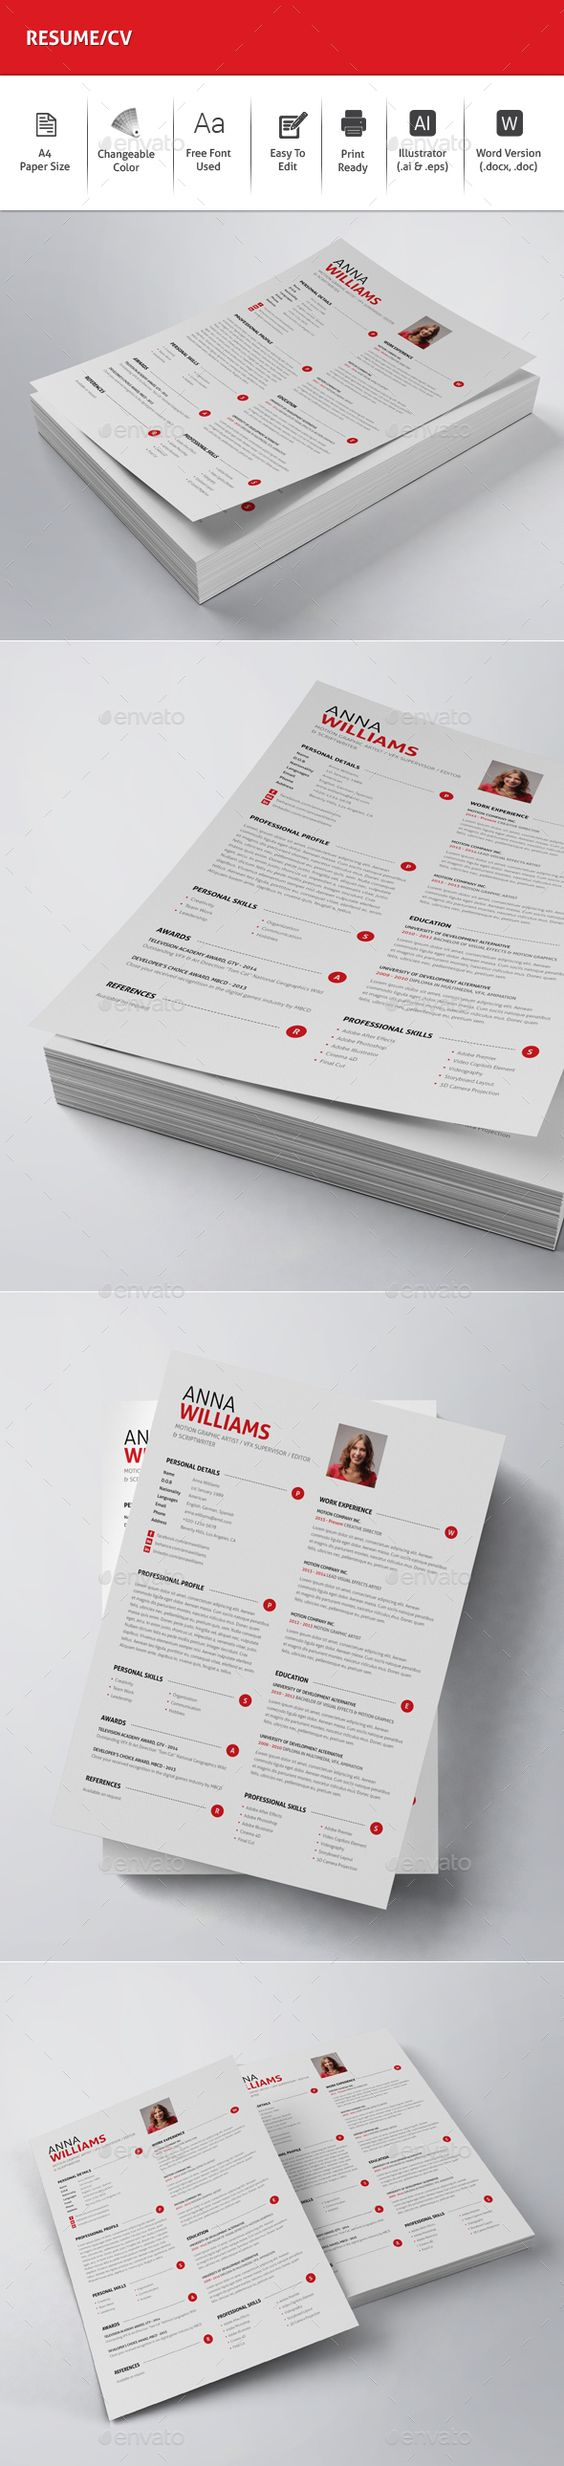 resume cv cv template and resume on pinterest